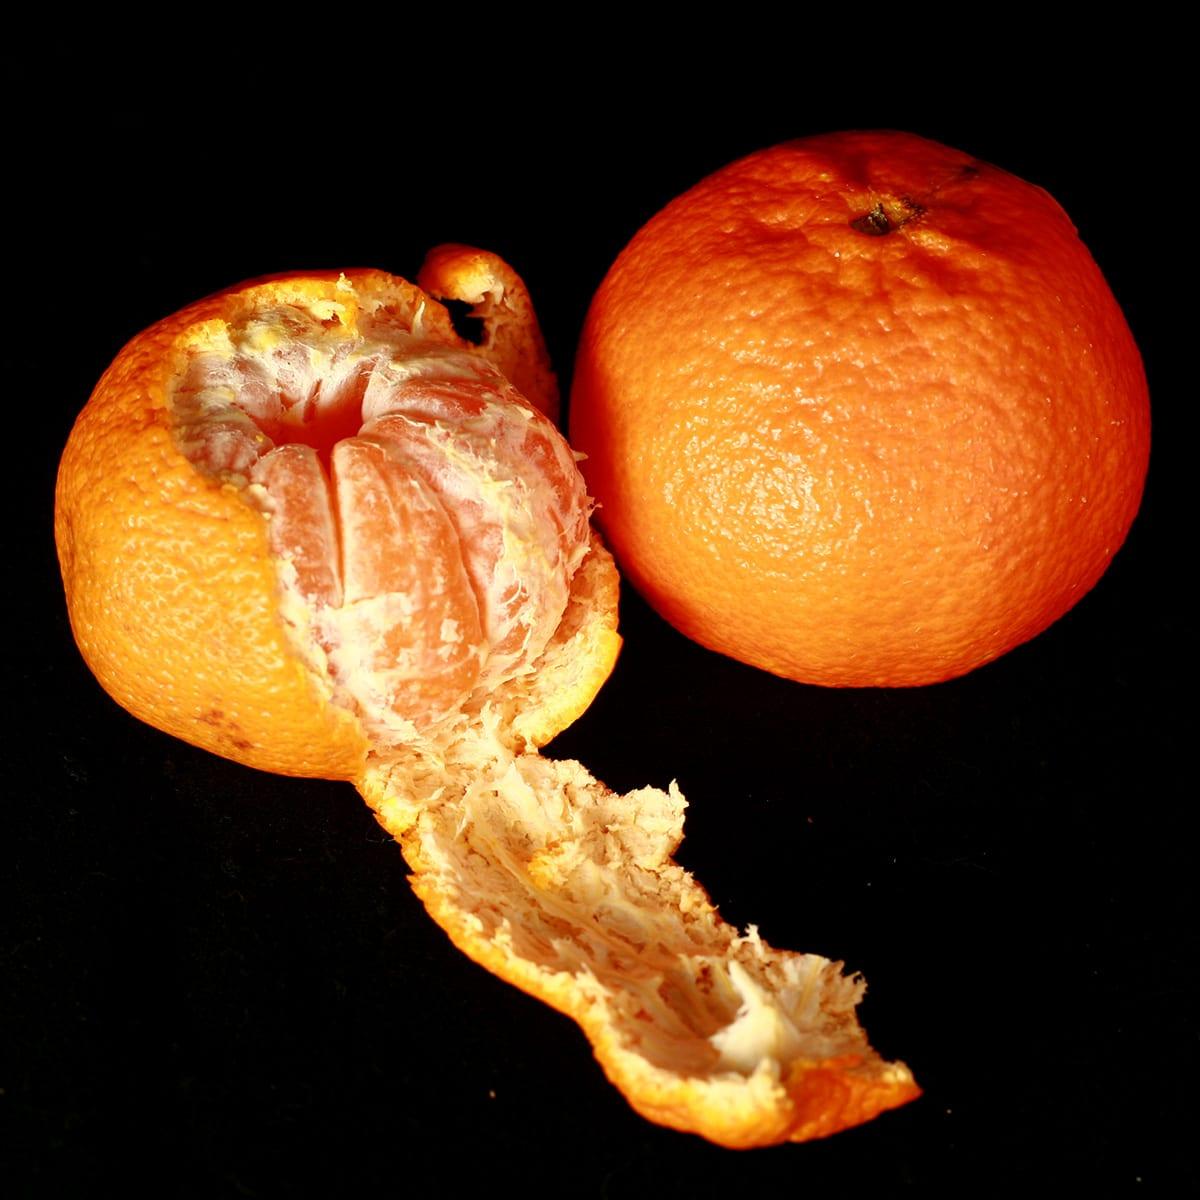 2 Algerian Mandarin oranges, one peeled.